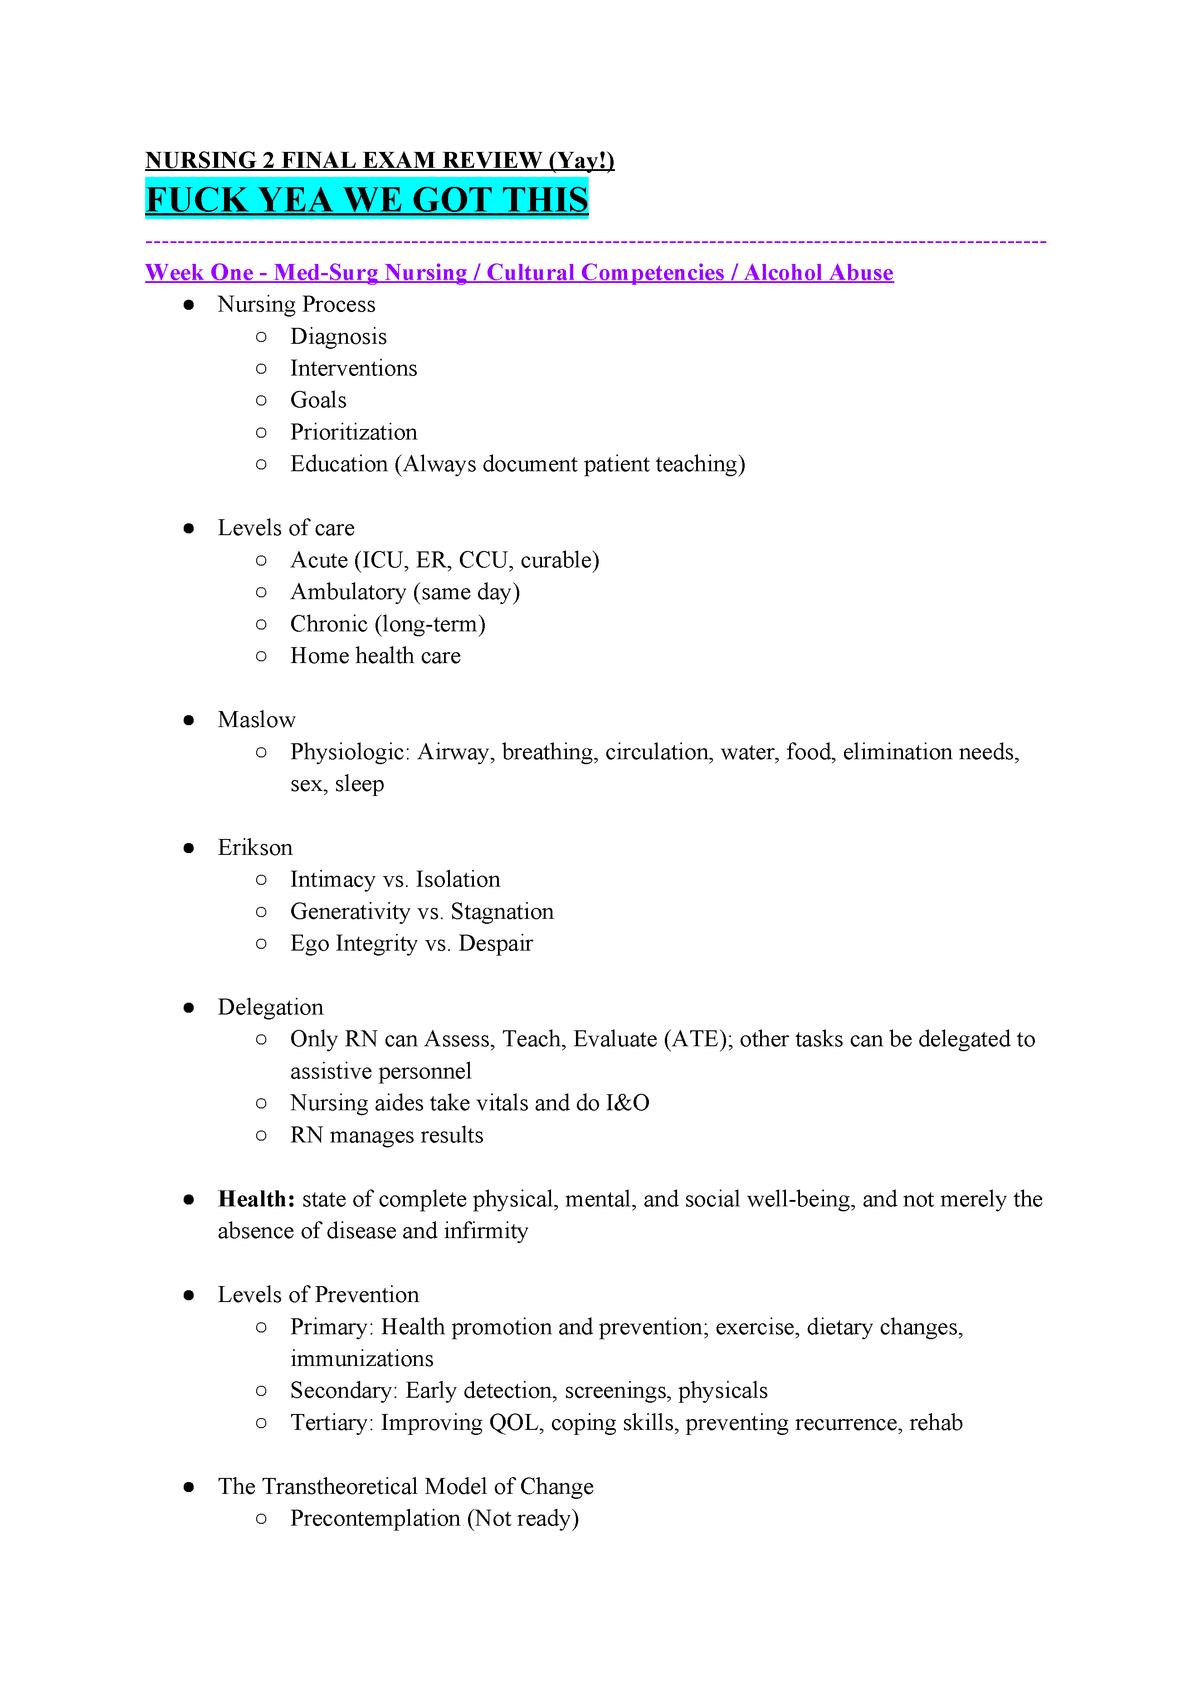 FINAL STUDY GUIDE Autumn semester 2018 - NUR 4130 - NSU